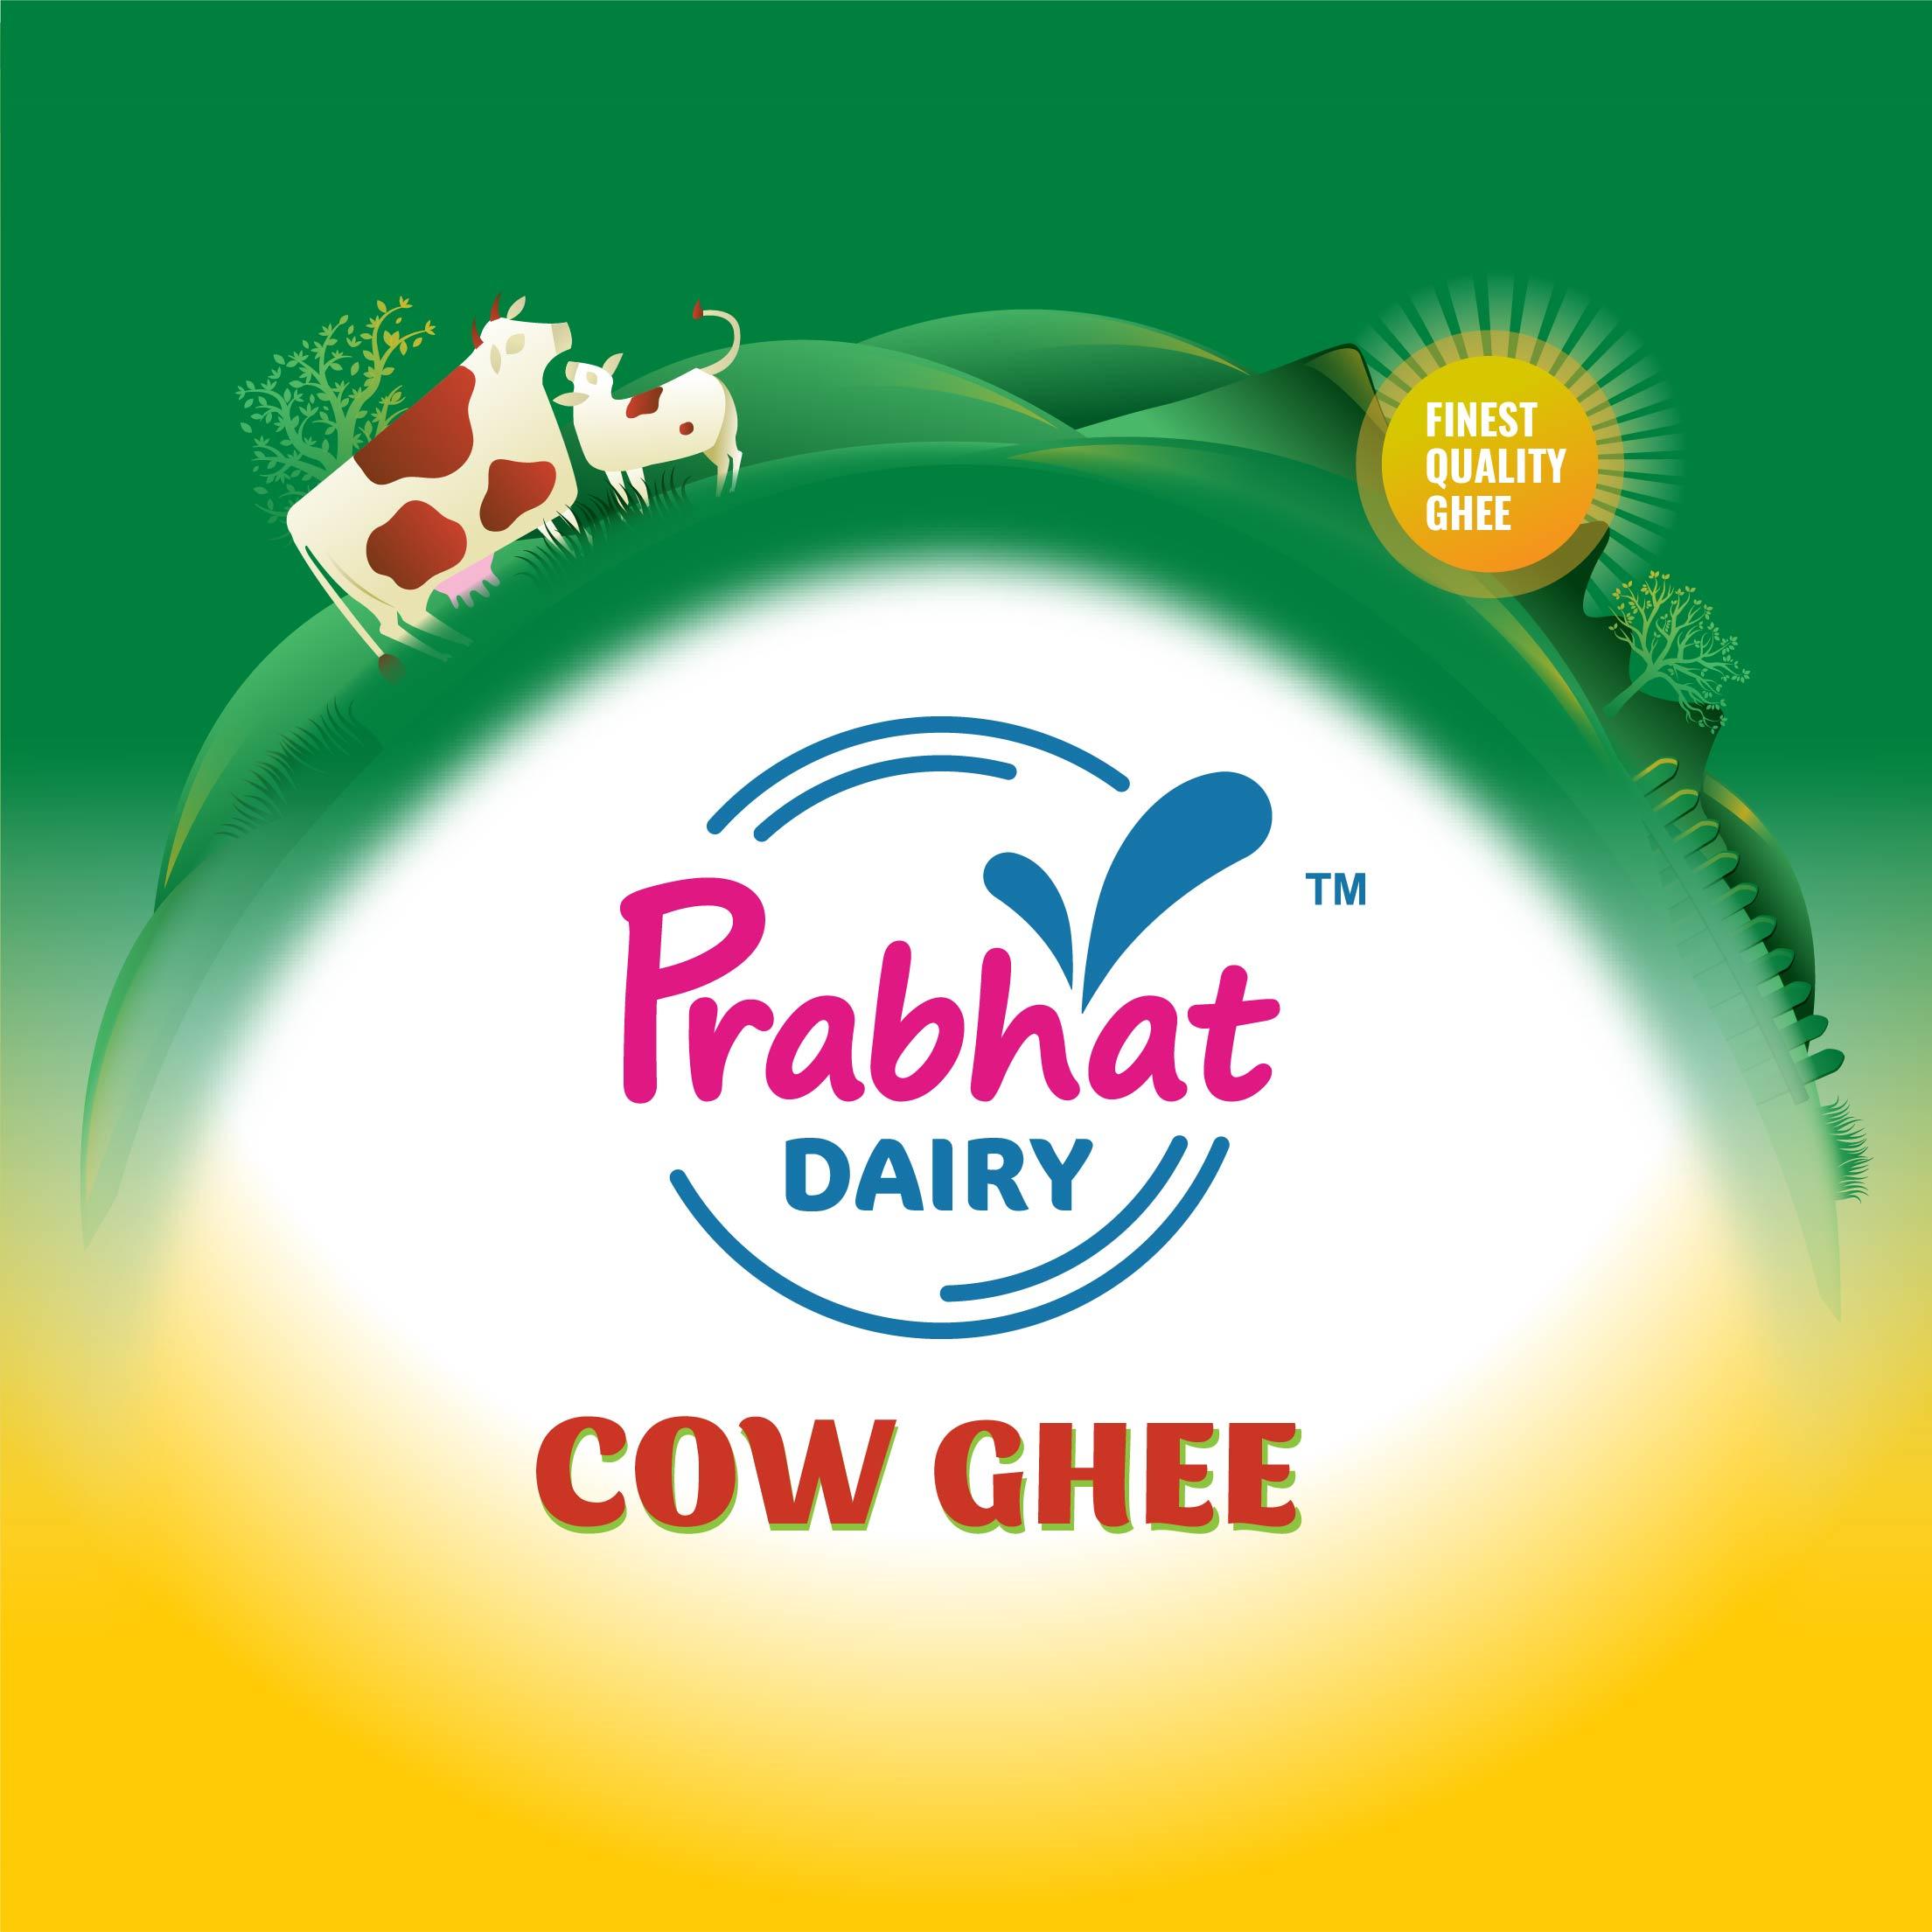 Prabhat Dairy_Product Design_Elephant Design 5.jpg